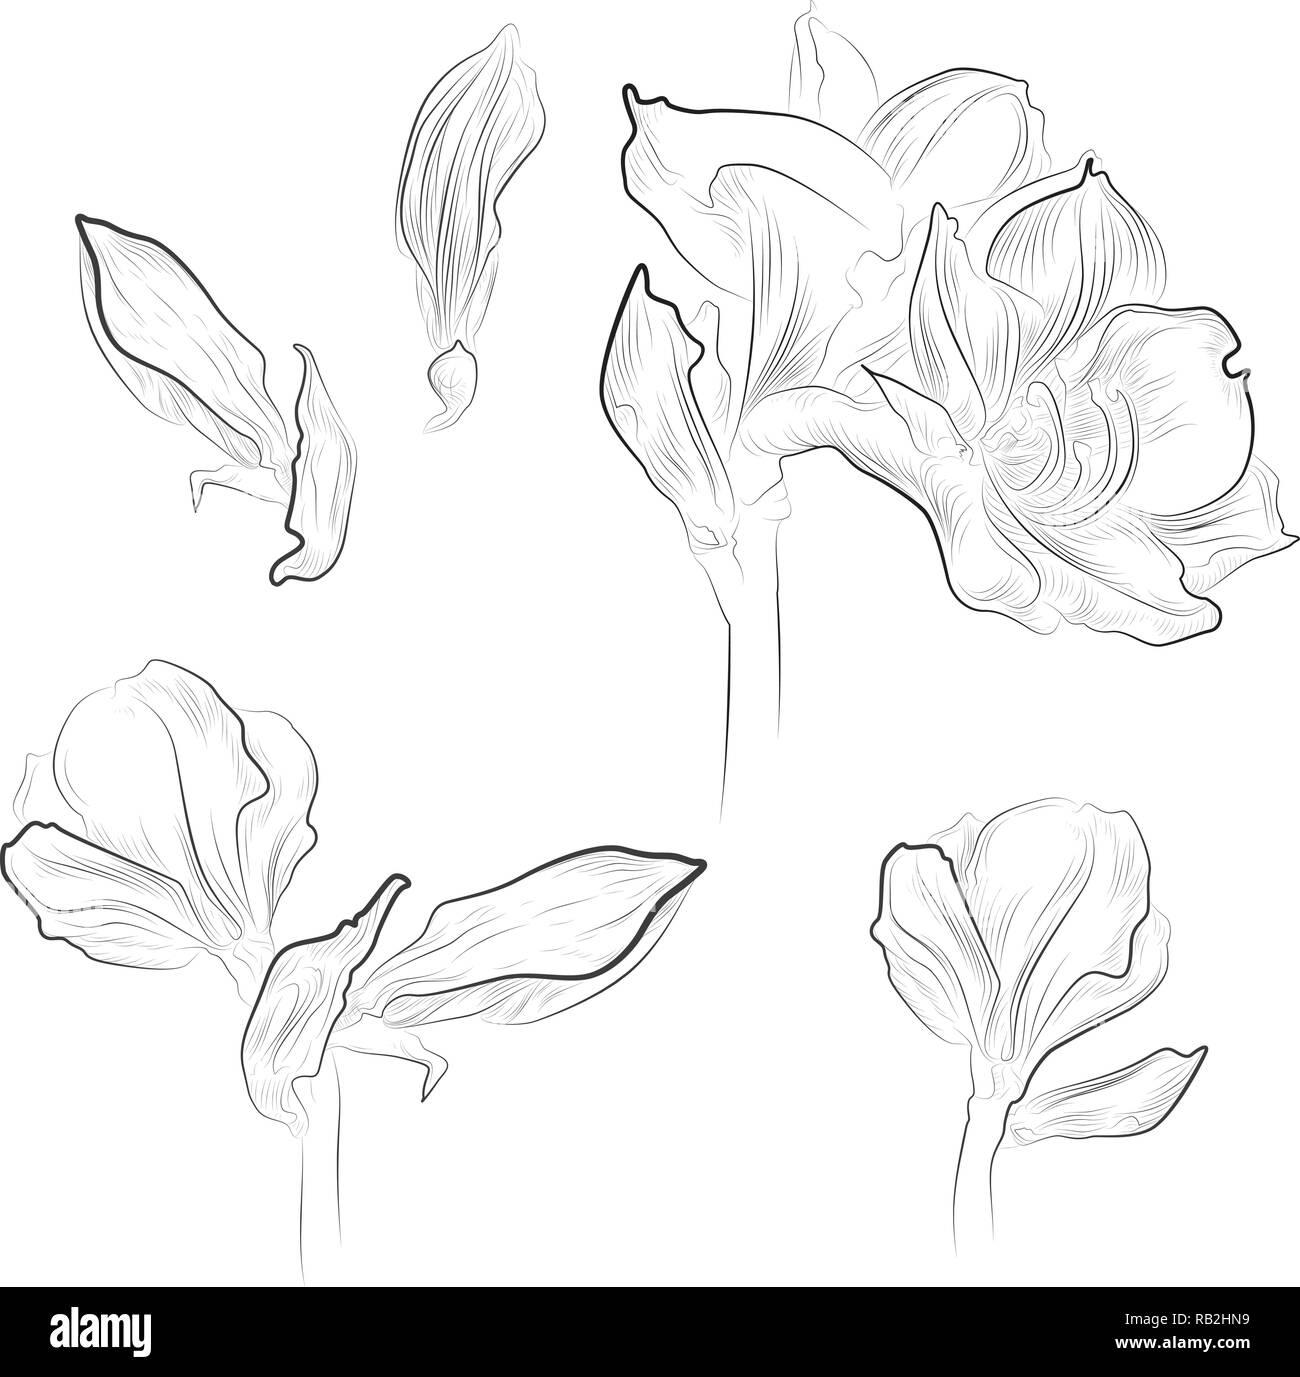 Monochrome amaryllis line drawings, isolated - Stock Vector